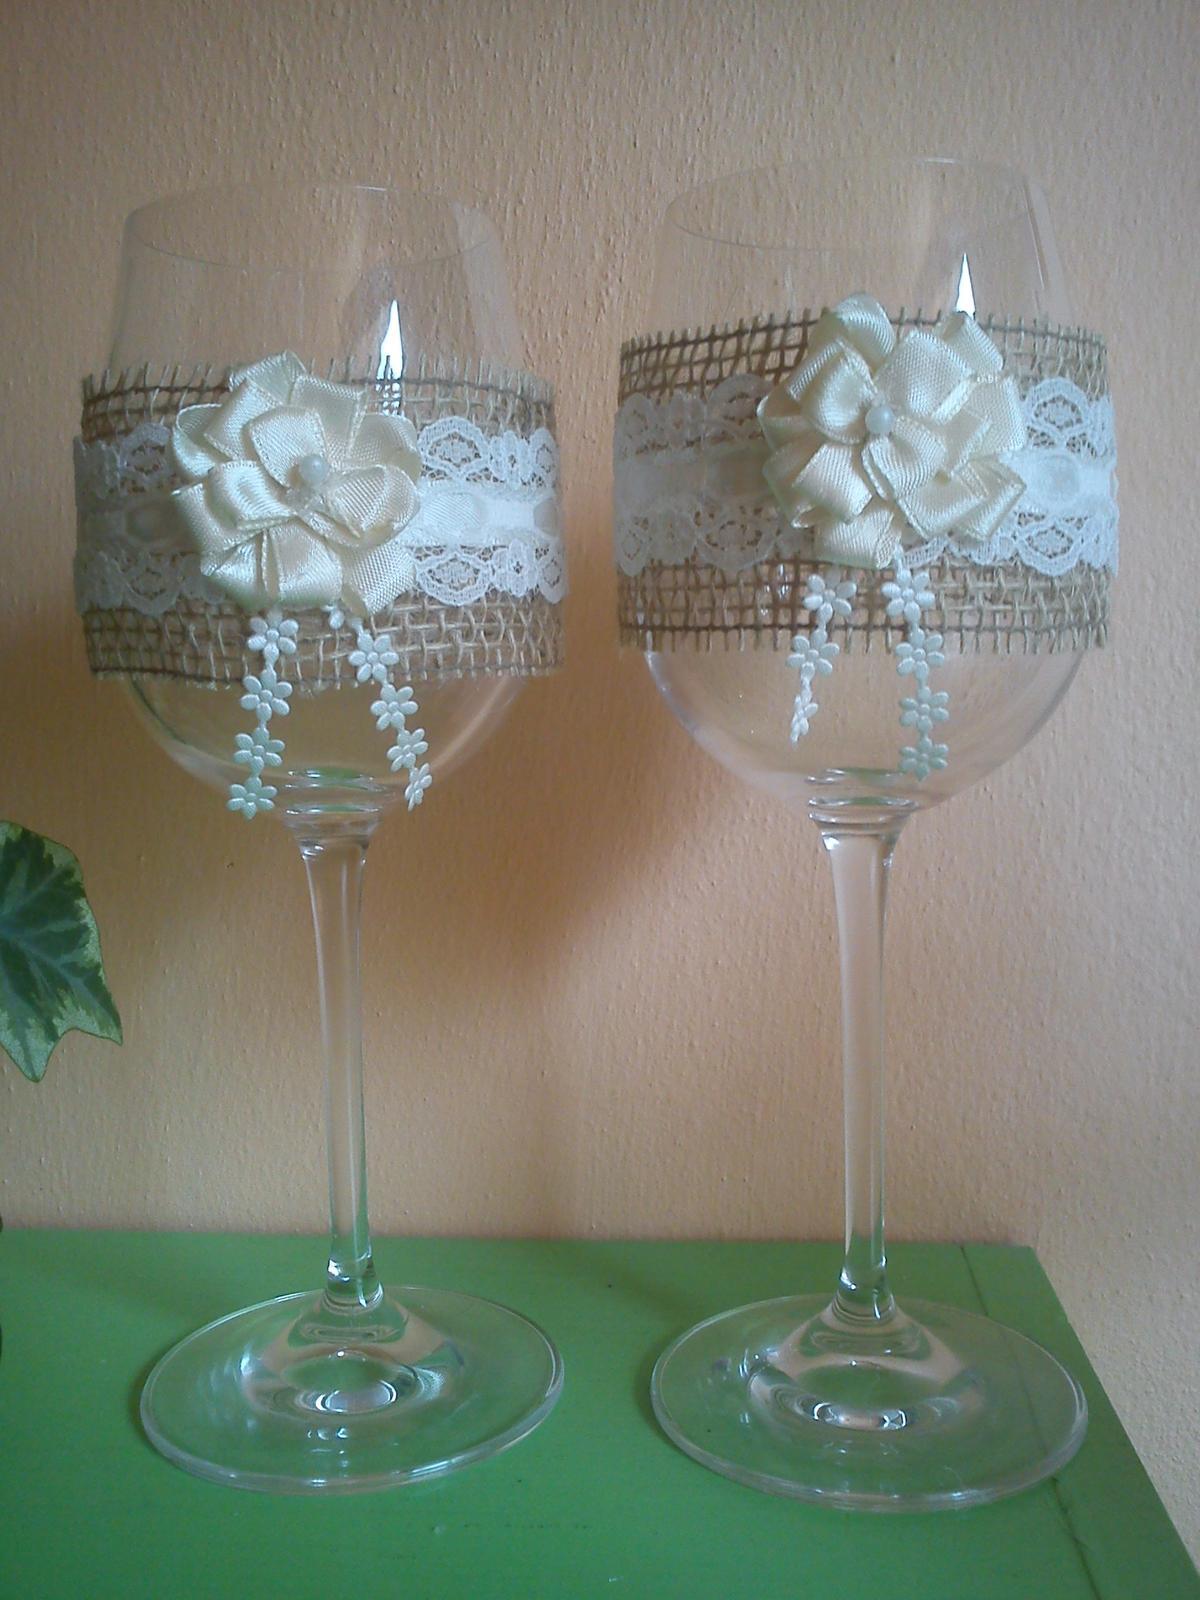 The First Day of Forever ♥ - naše svadobné poháre, ozdobila šikovná kamarátka :)